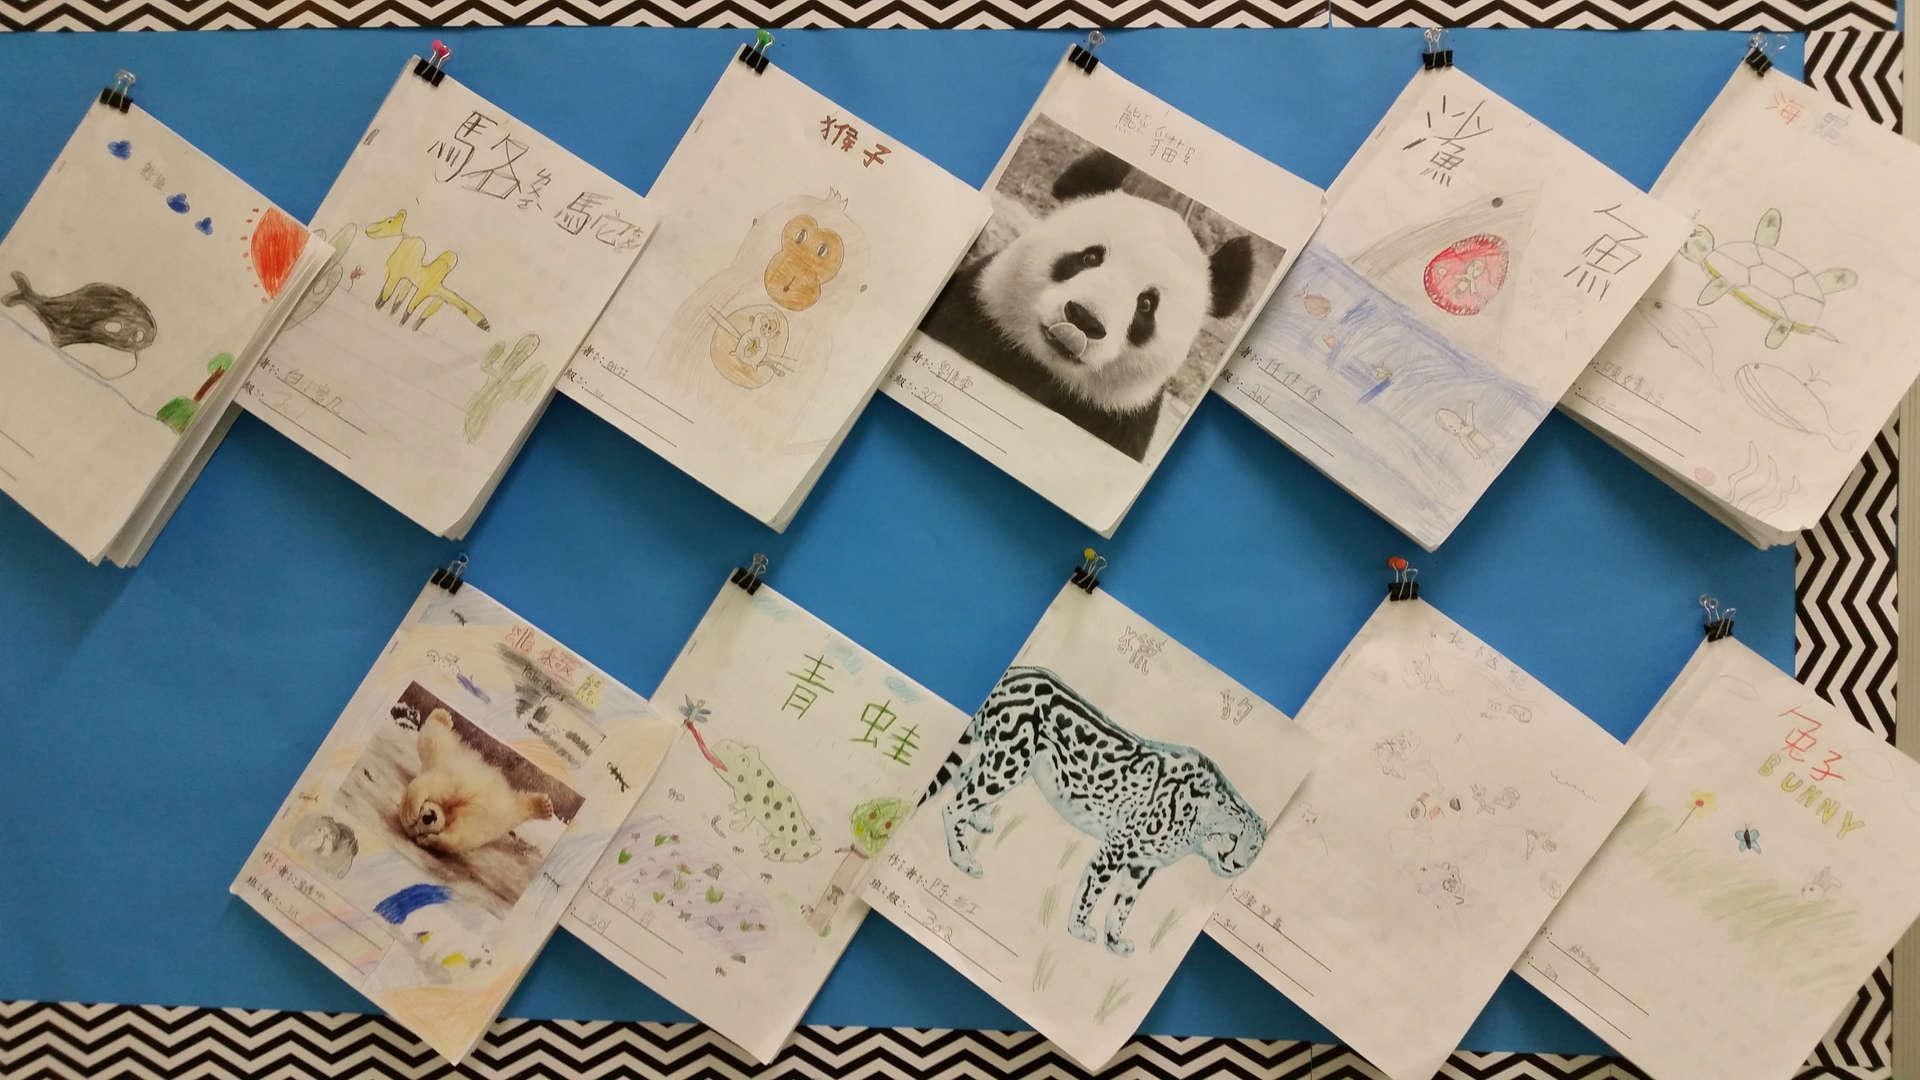 Student works demonstrate fluent Chinese and English skills.學生作品展現流利的中英文技巧。